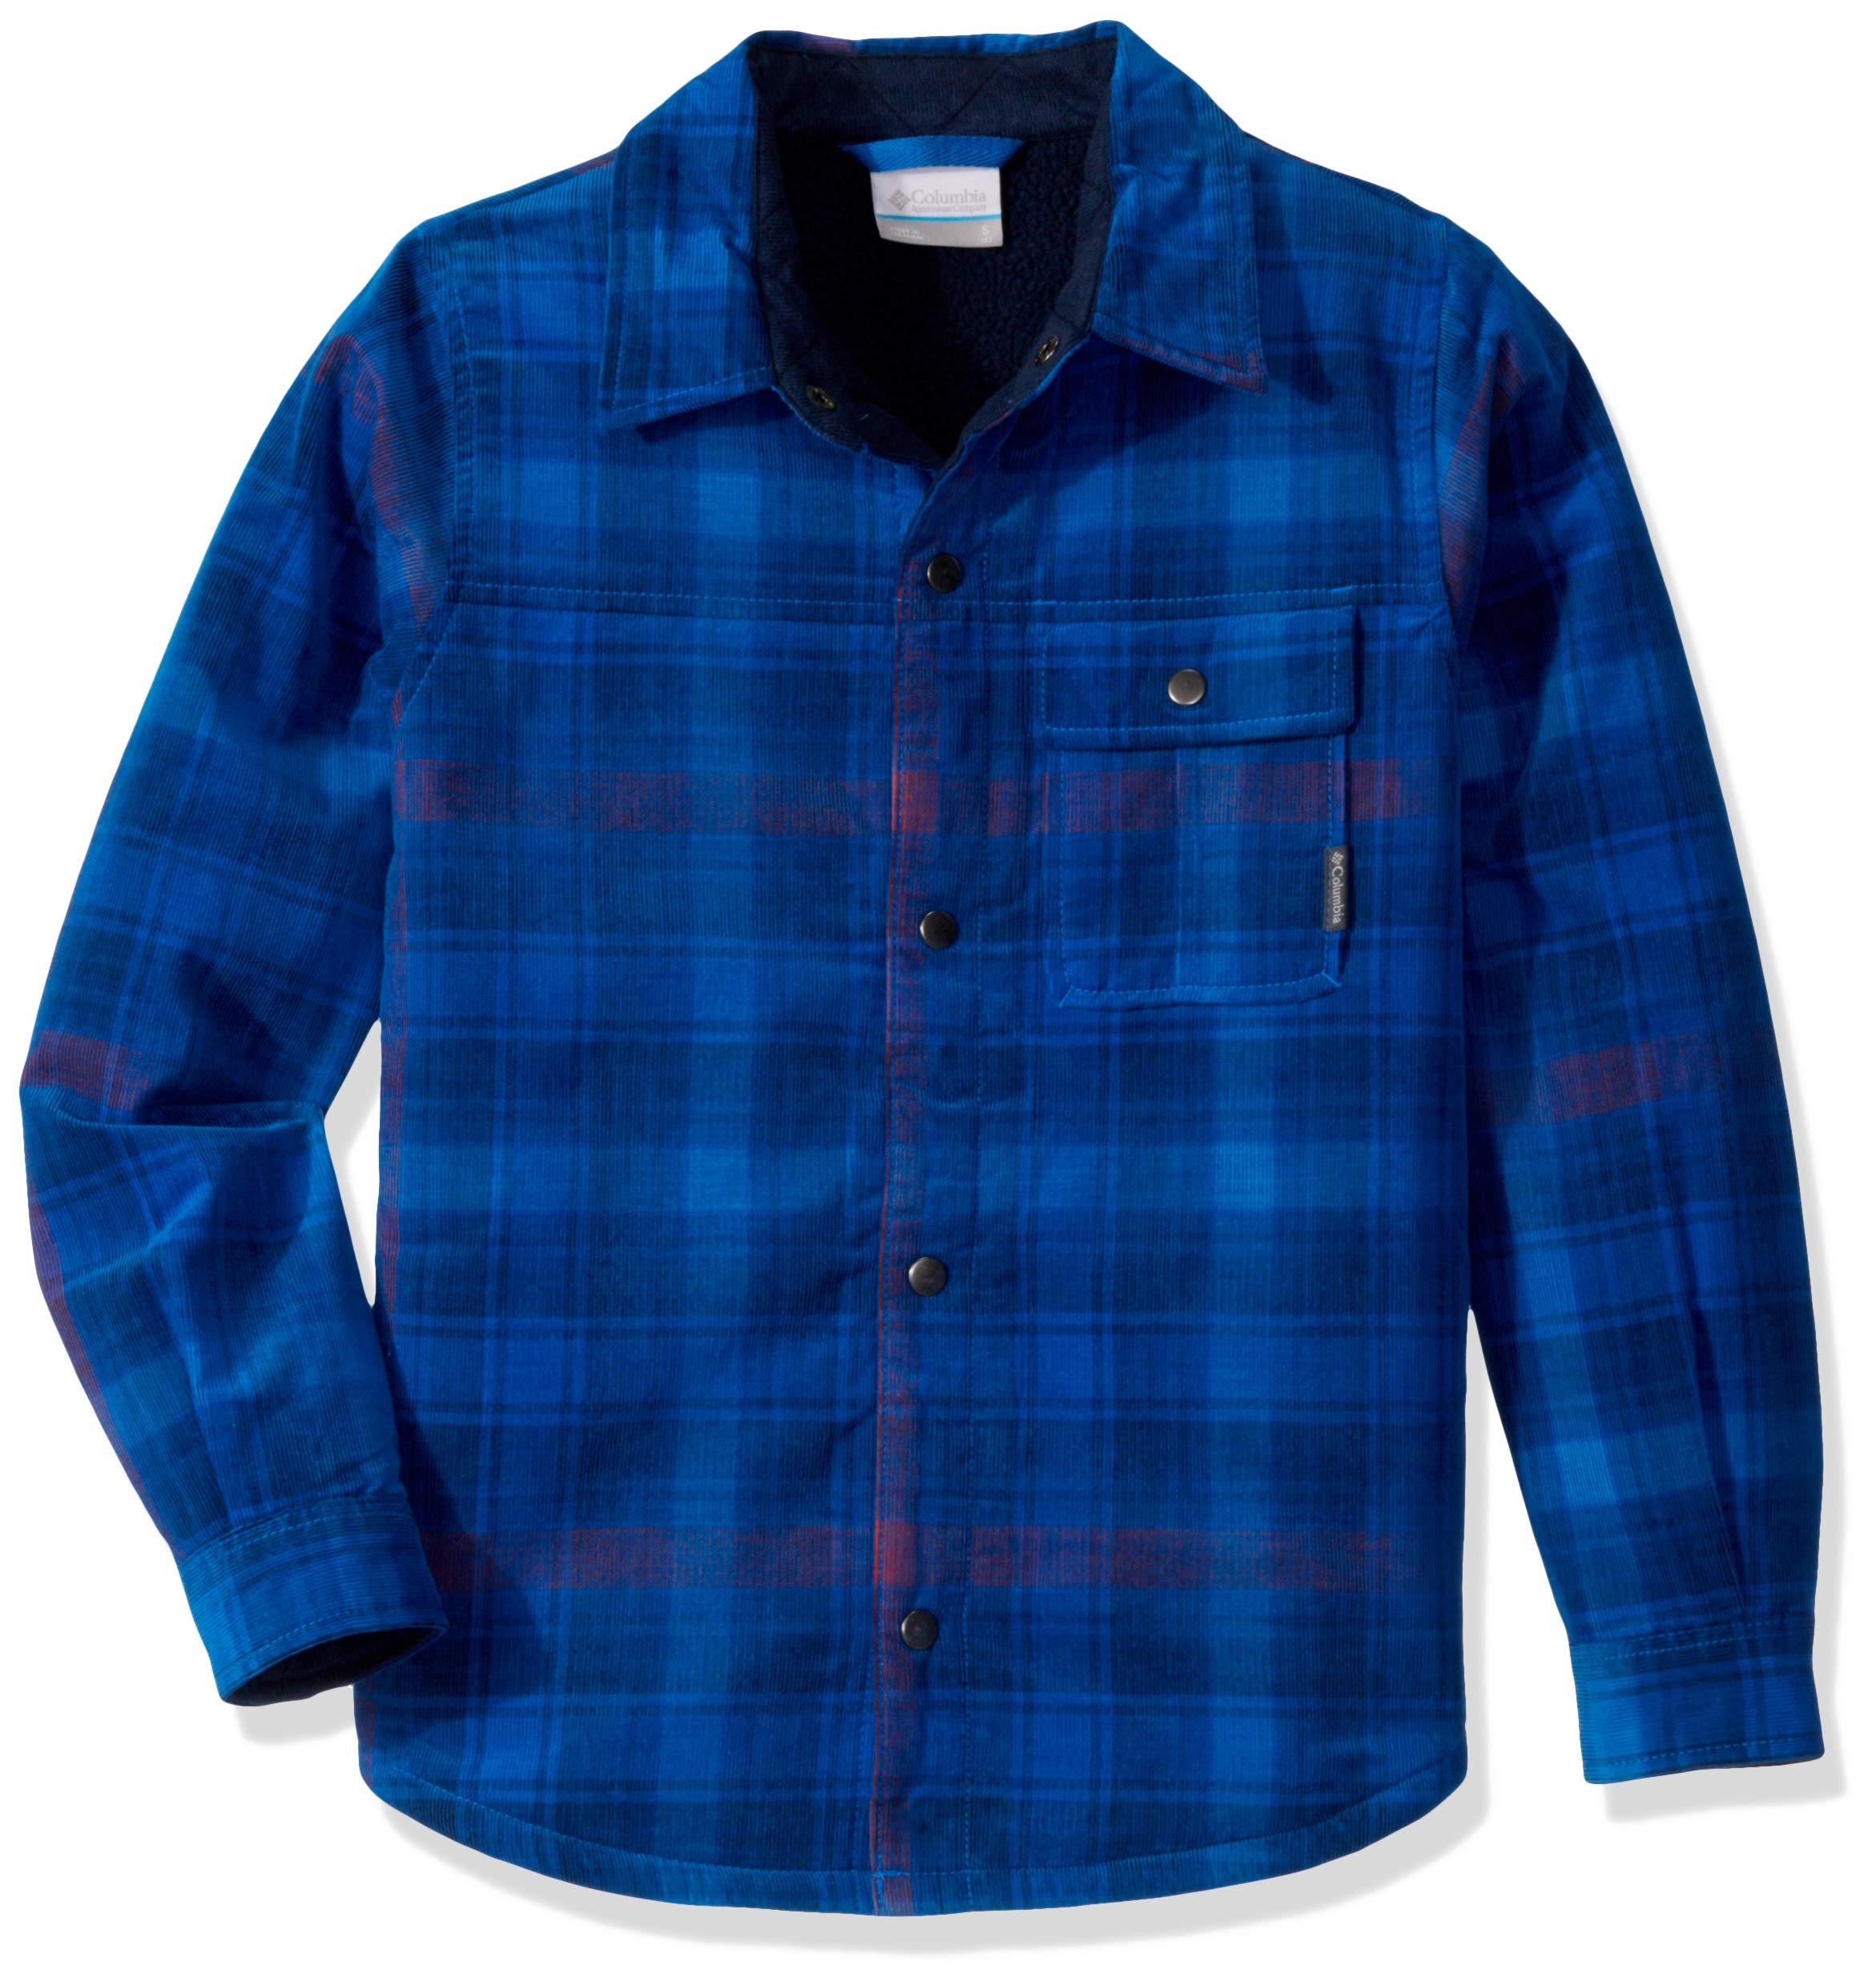 Columbia Boys' Big Windward Sherpa-LinedShirt Jacket, Super Blue Plaid, Large by Columbia